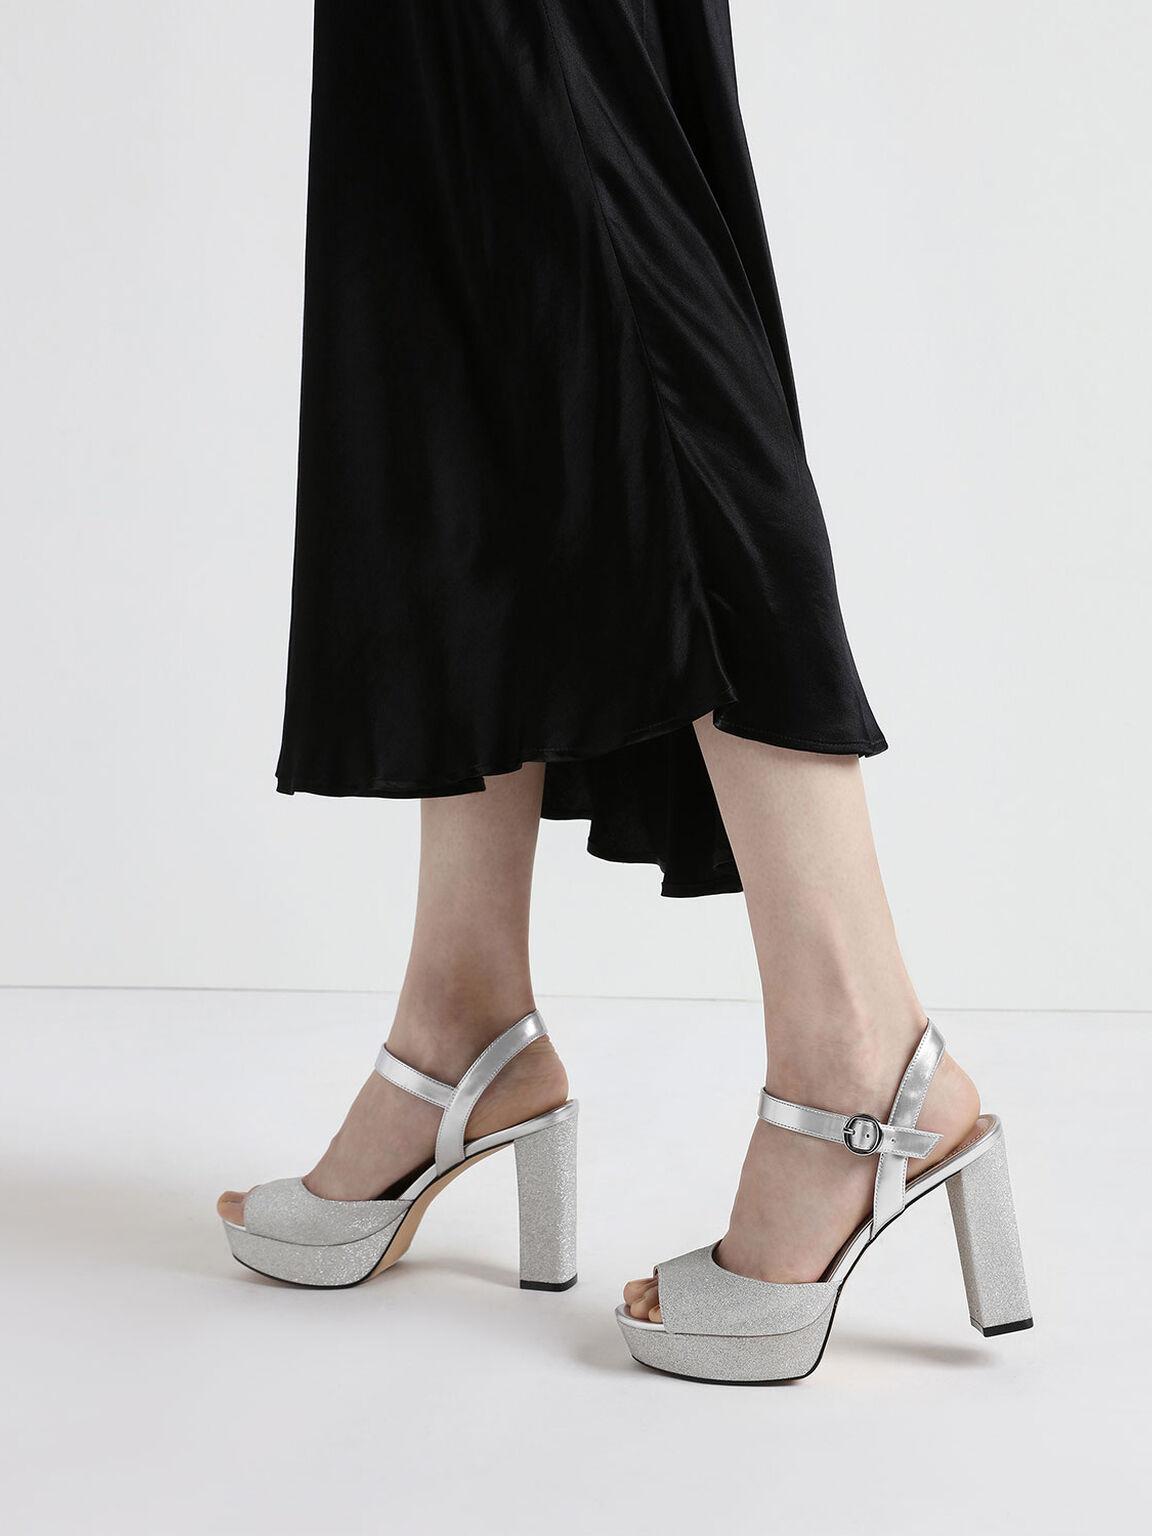 Glitter Platform Heels, Silver, hi-res